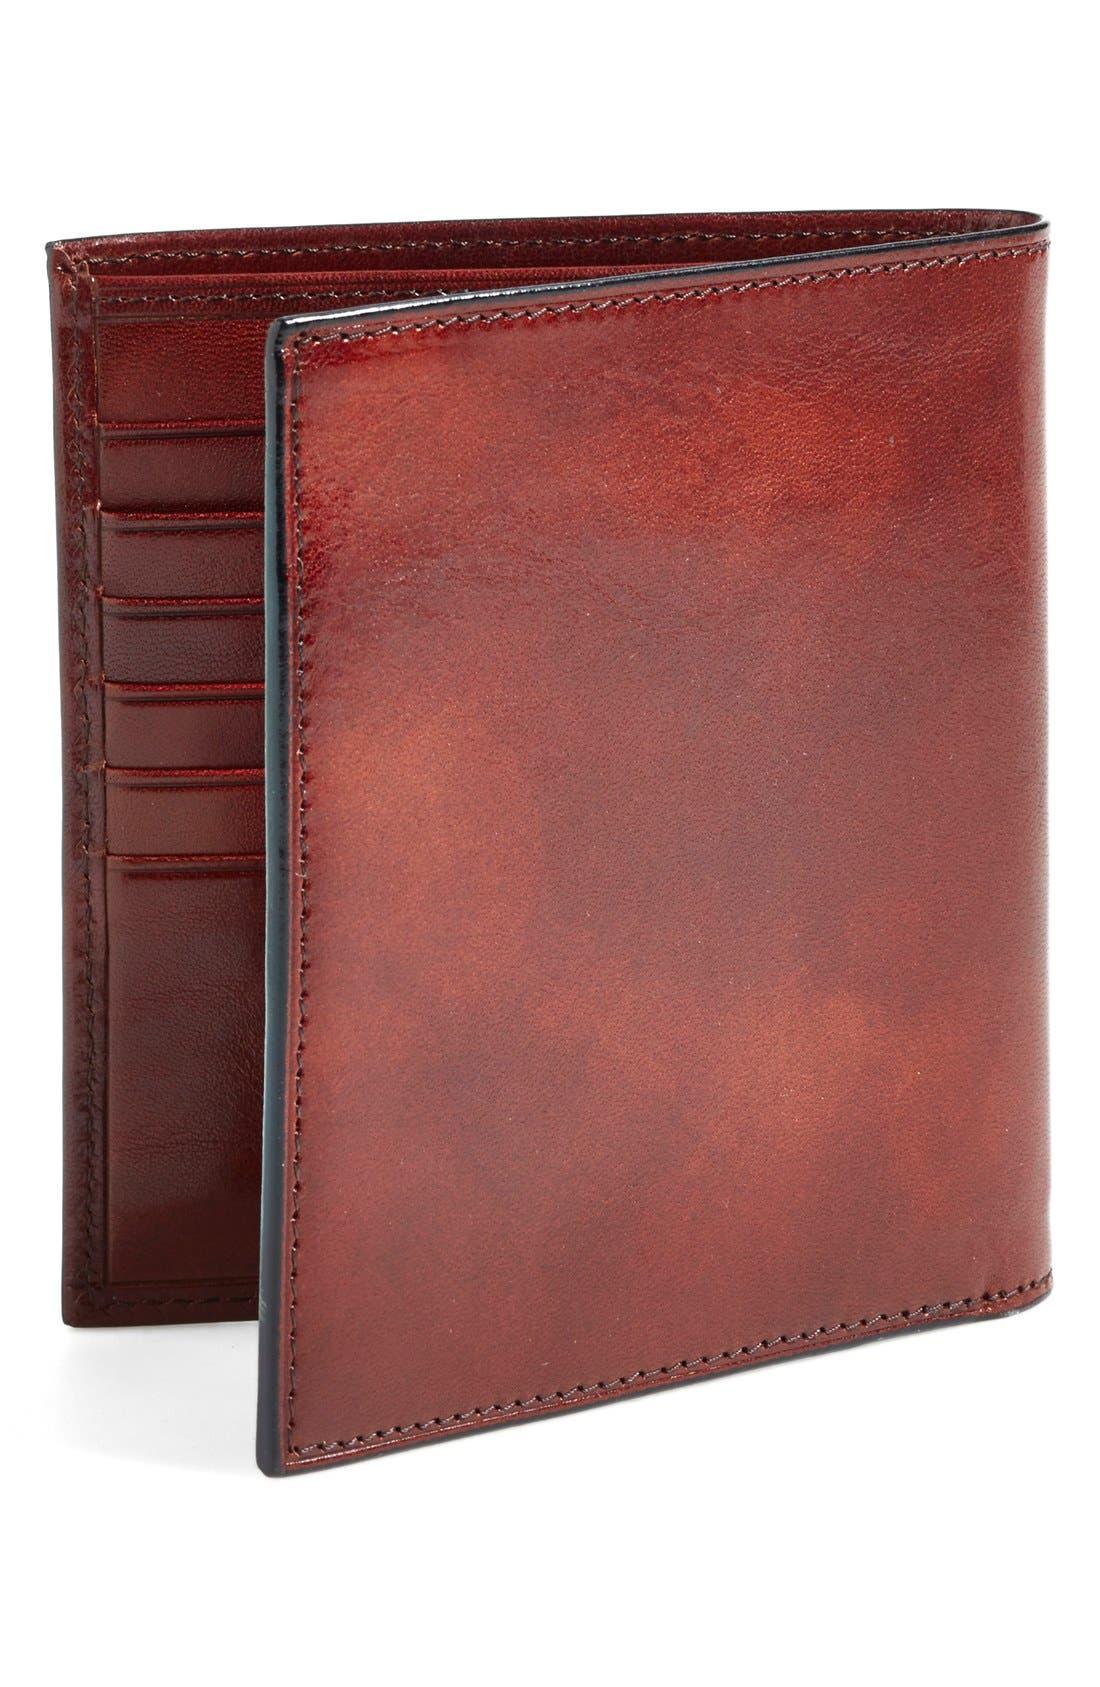 'Old Leather' Credit Wallet,                             Alternate thumbnail 2, color,                             DARK BROWN